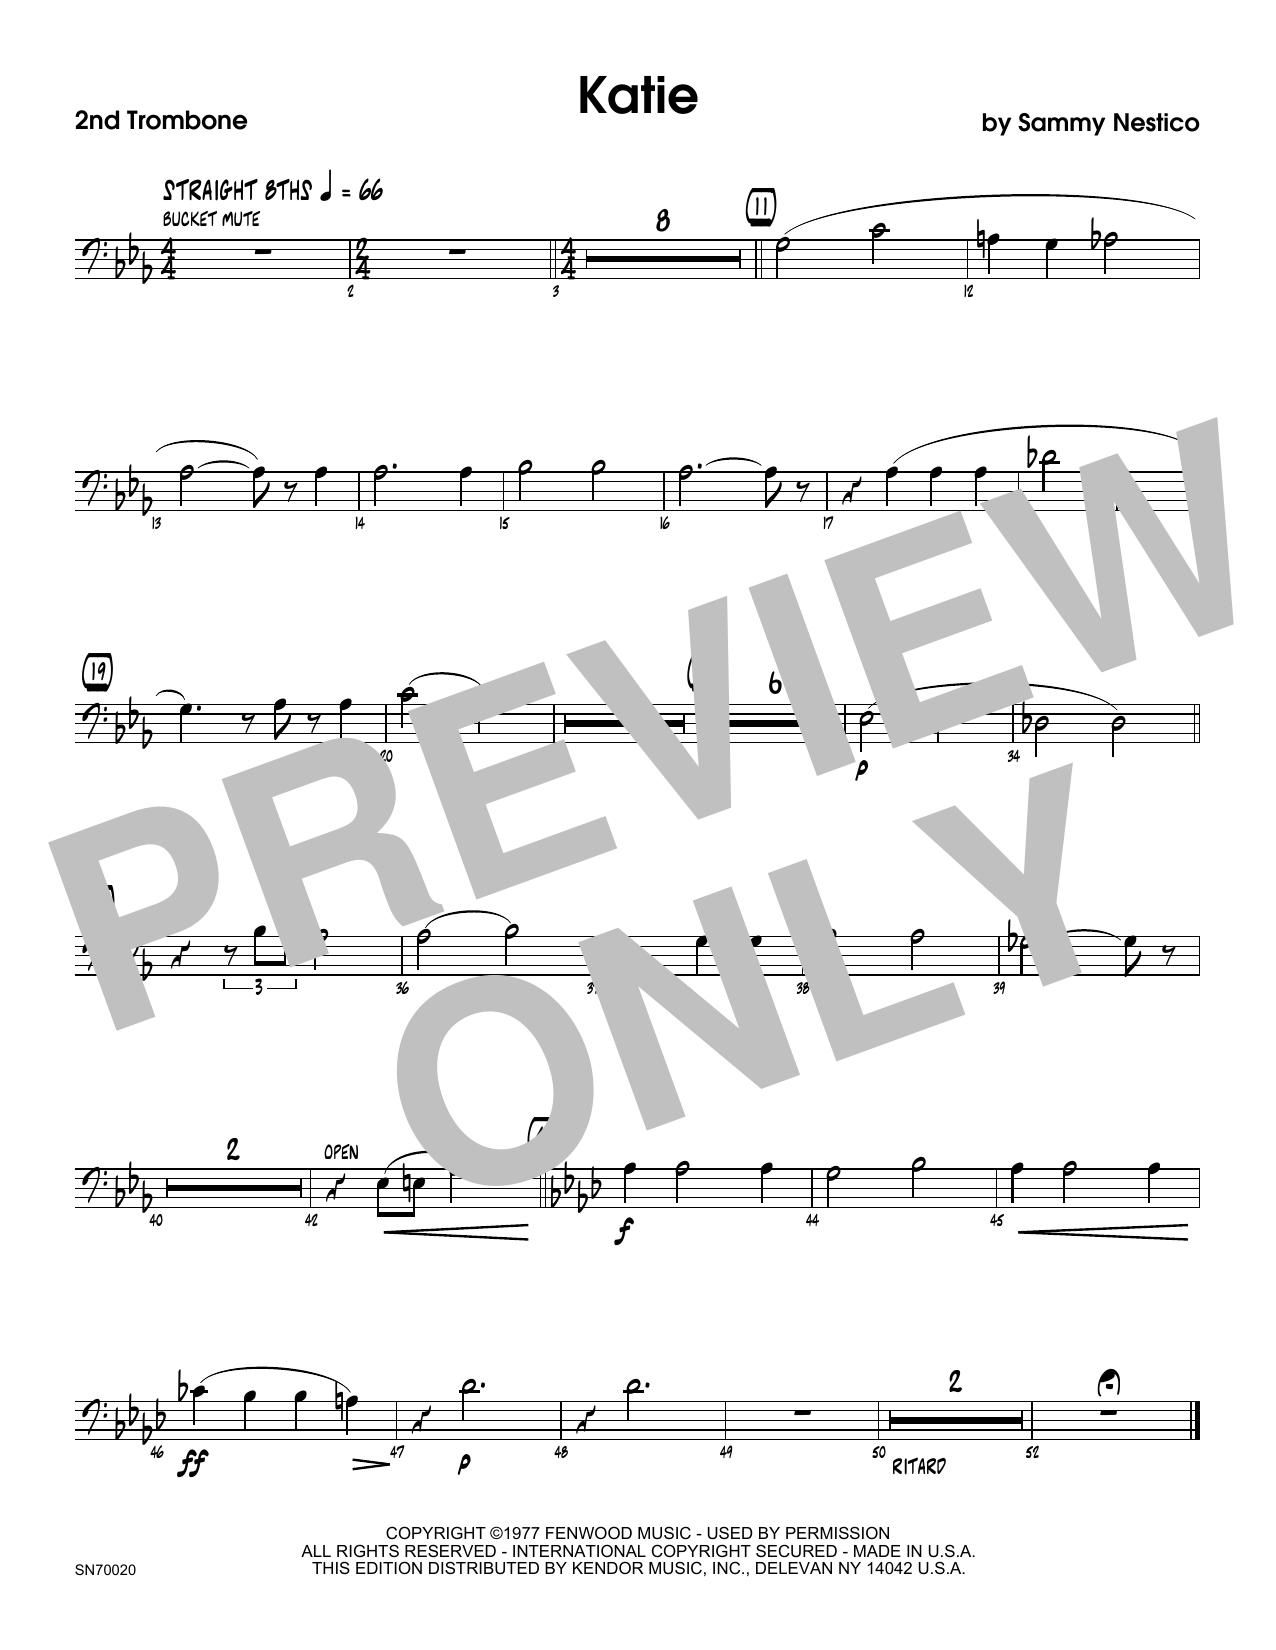 Katie - 2nd Trombone Sheet Music